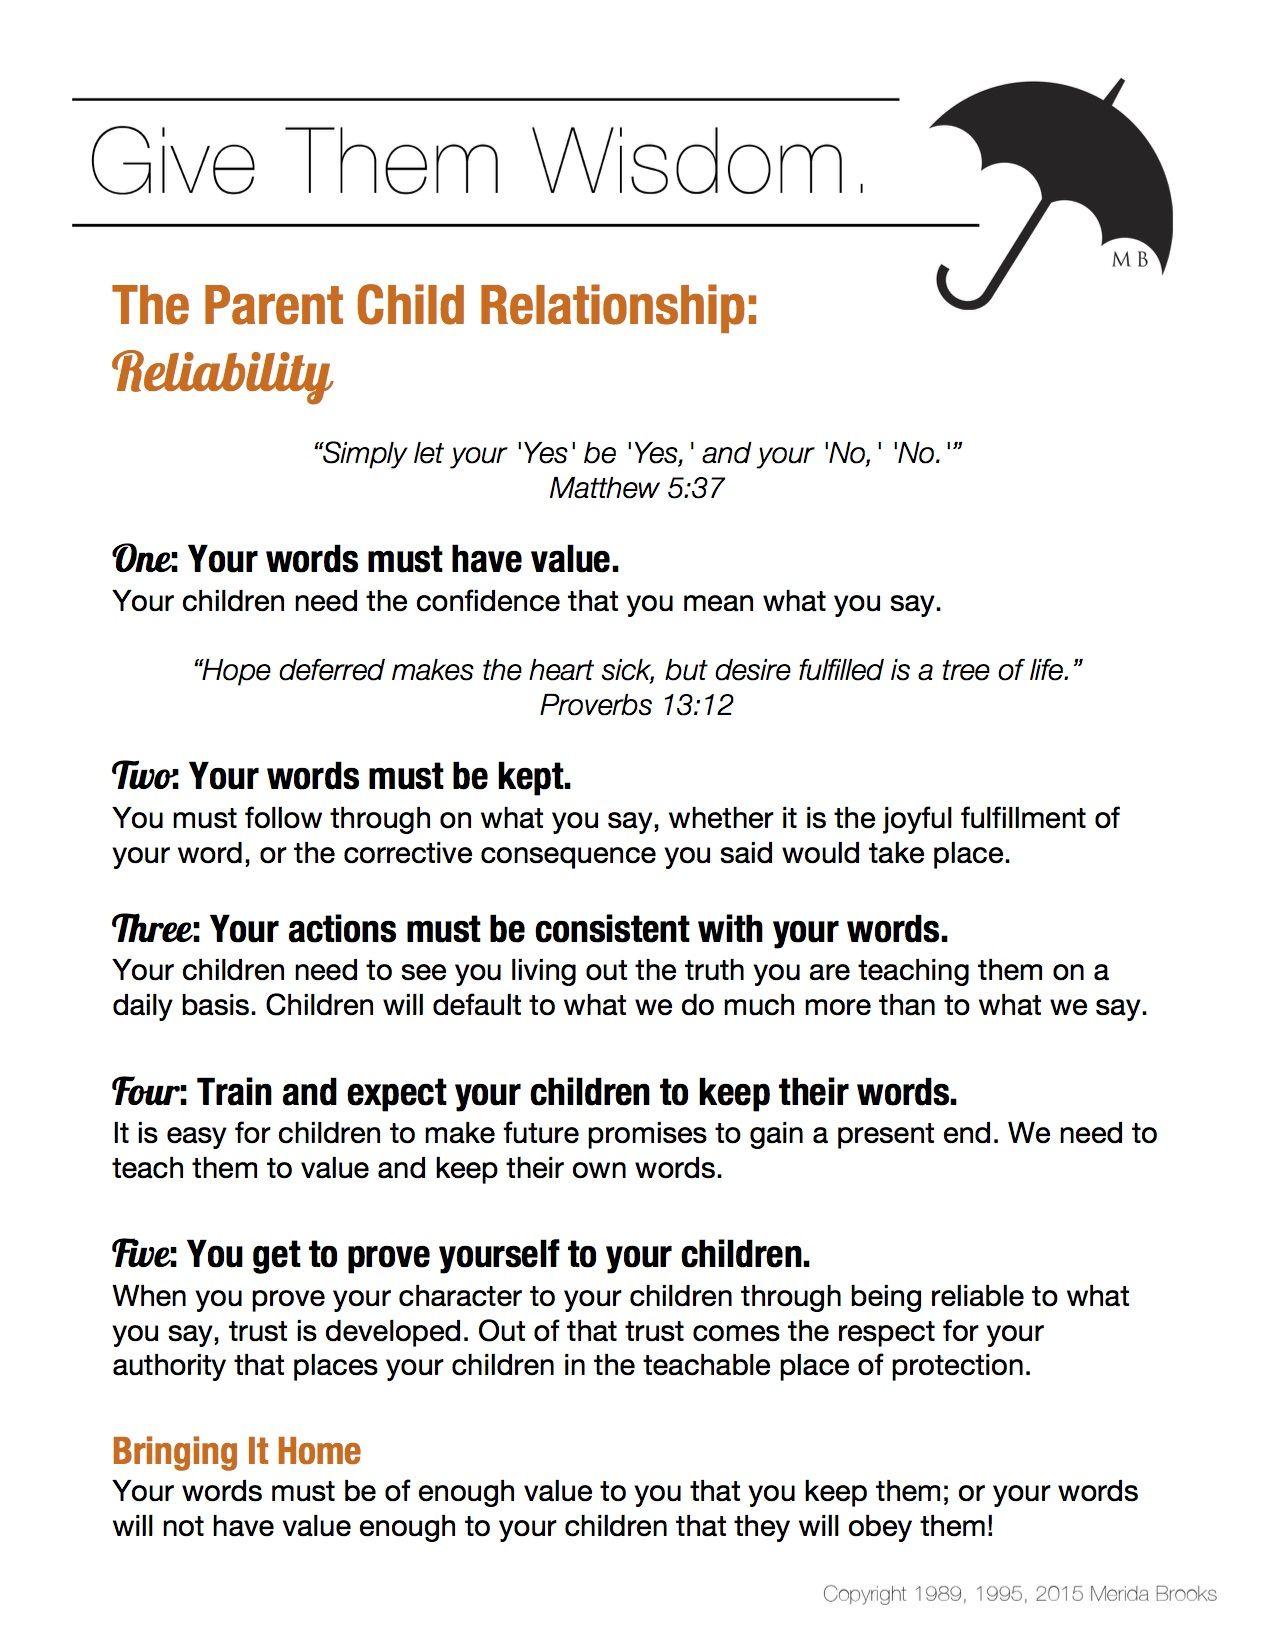 The Parent Child Relationship Reliability